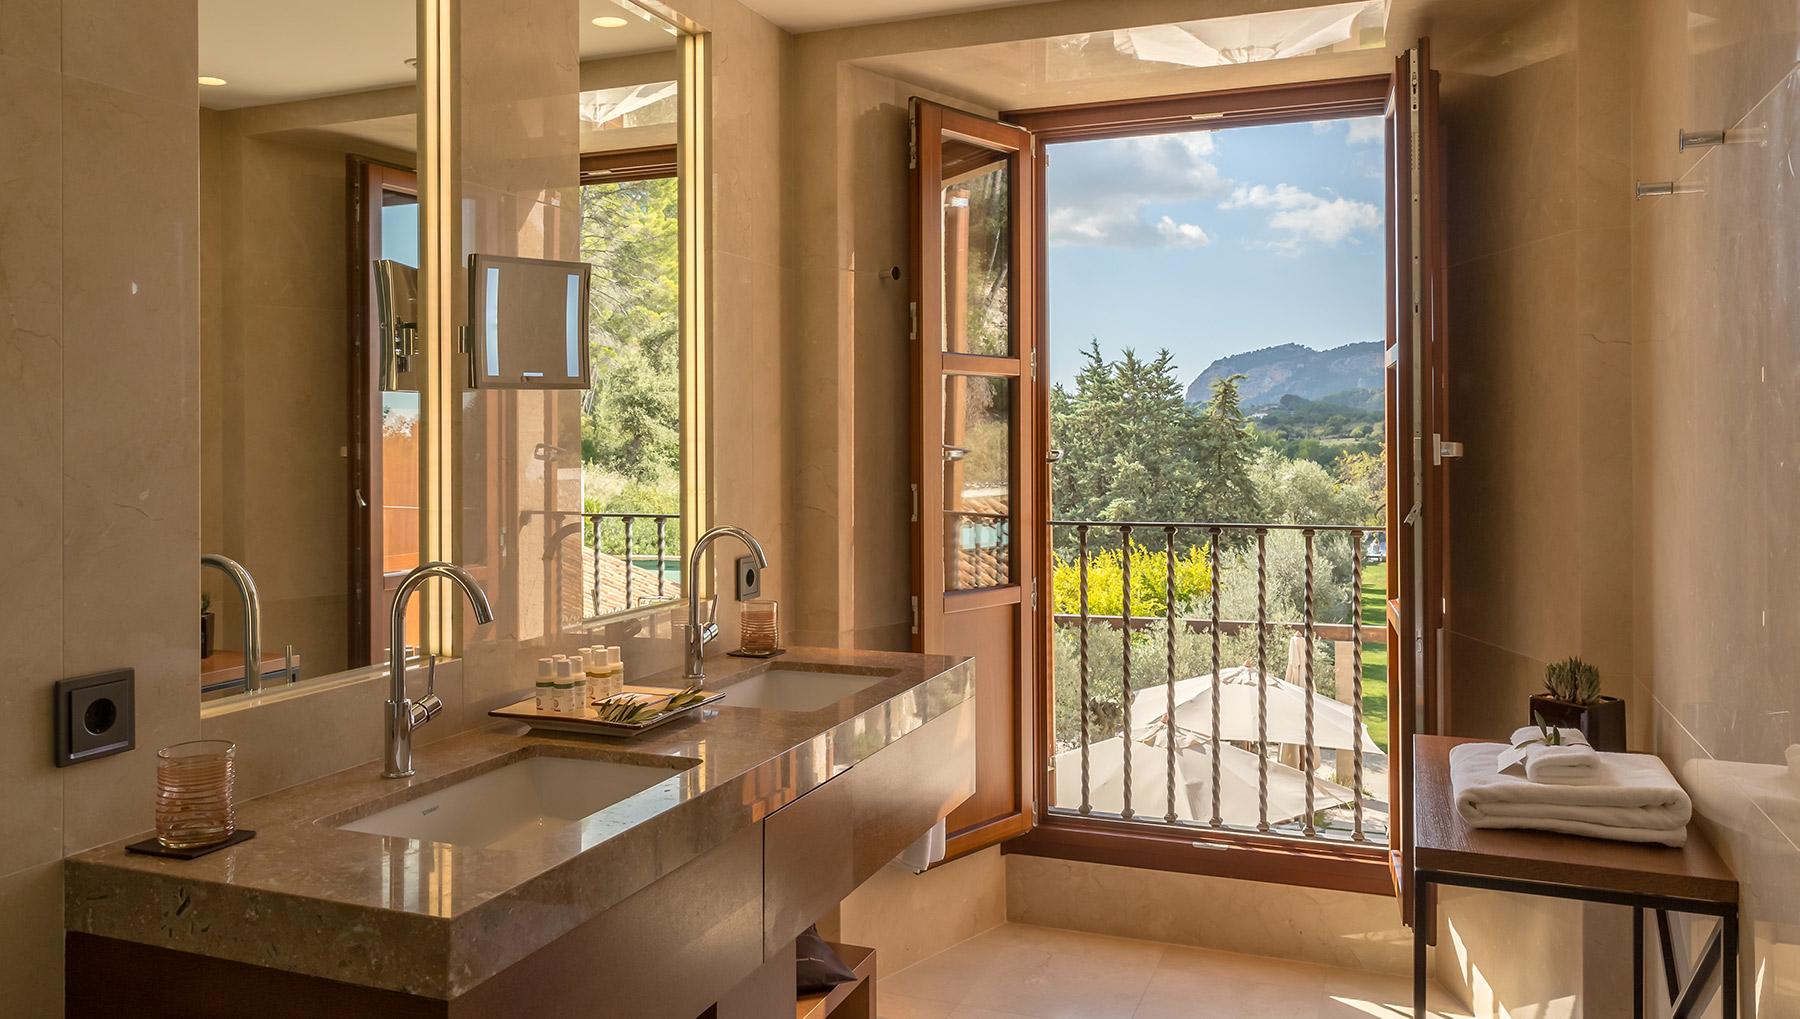 FINESSE, Magazin, Travel, Gourmet, Food, Mallorca, Hotel, Castell Son Claret, Luxusurlaub, Luxusrefugium, Deluxe Doppelzimmer, Badezimmer